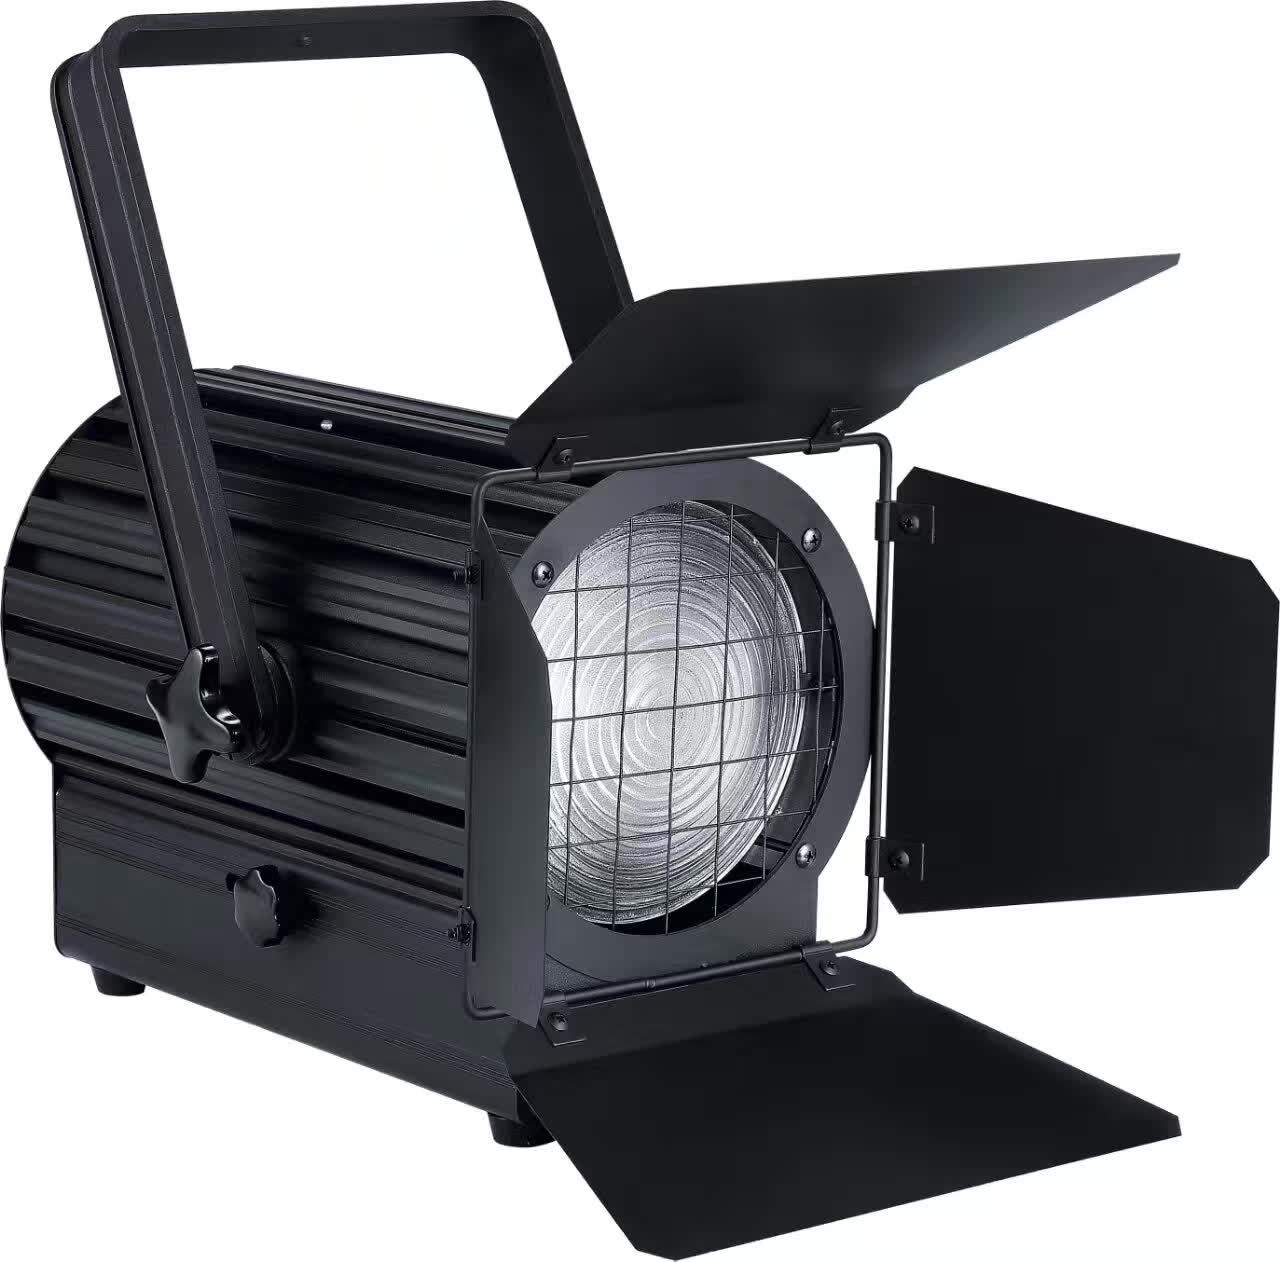 How to choose outdoor lighting?